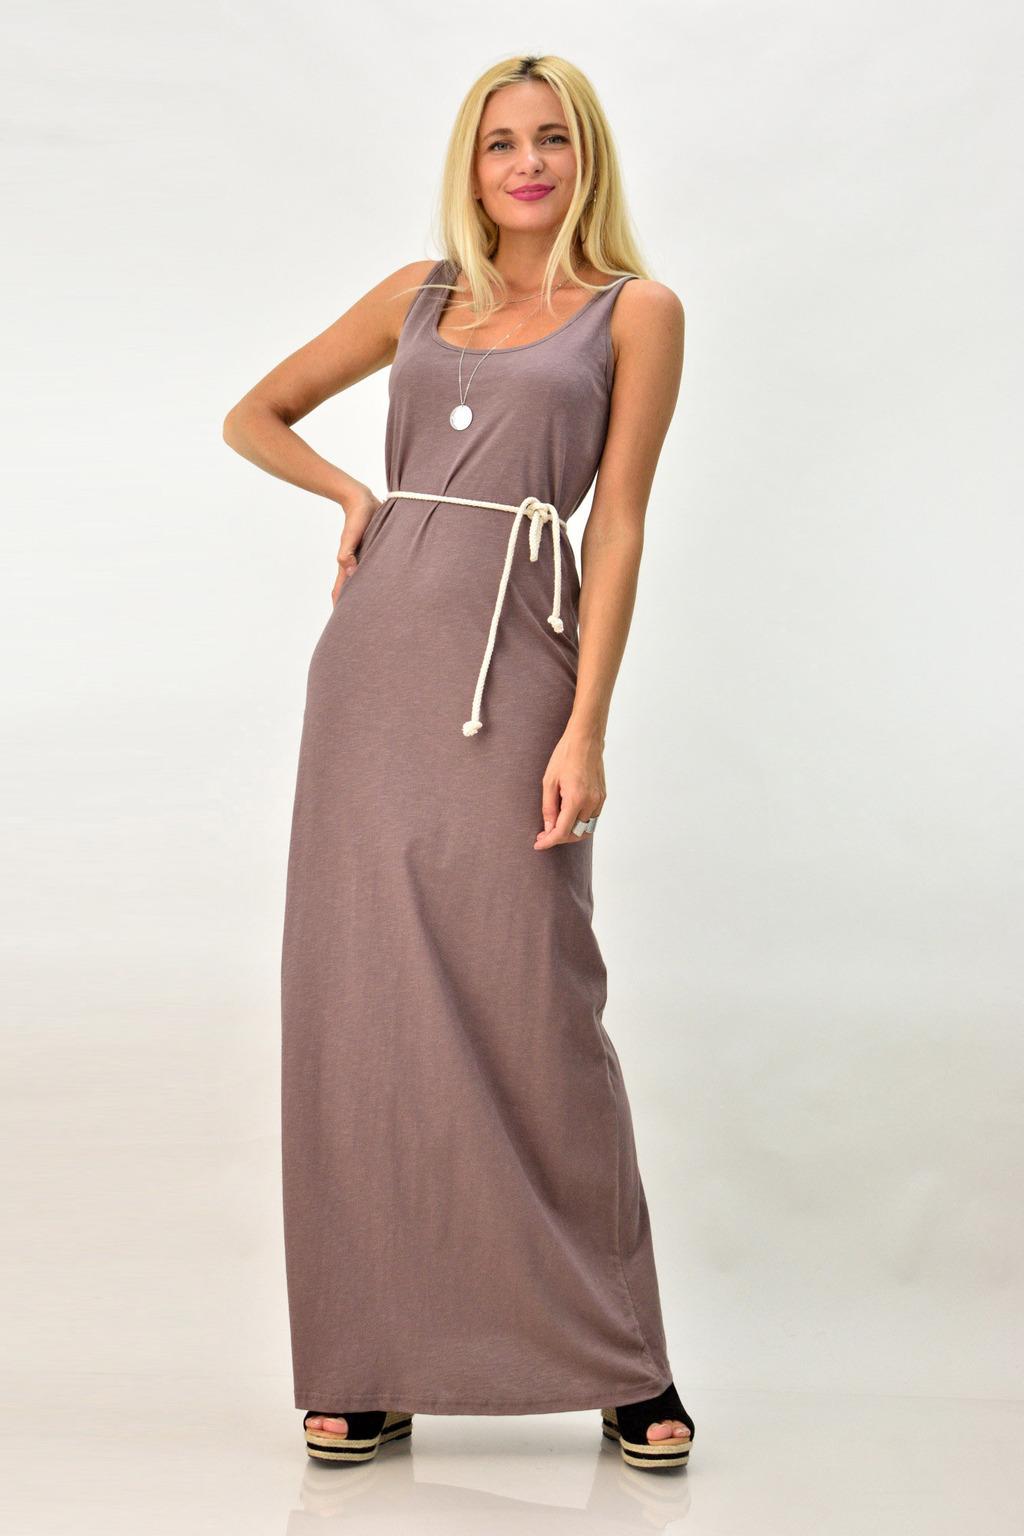 7ff699a76f2 Μακρύ καθημερινό φόρεμα με άνοιγμα στη πλάτη